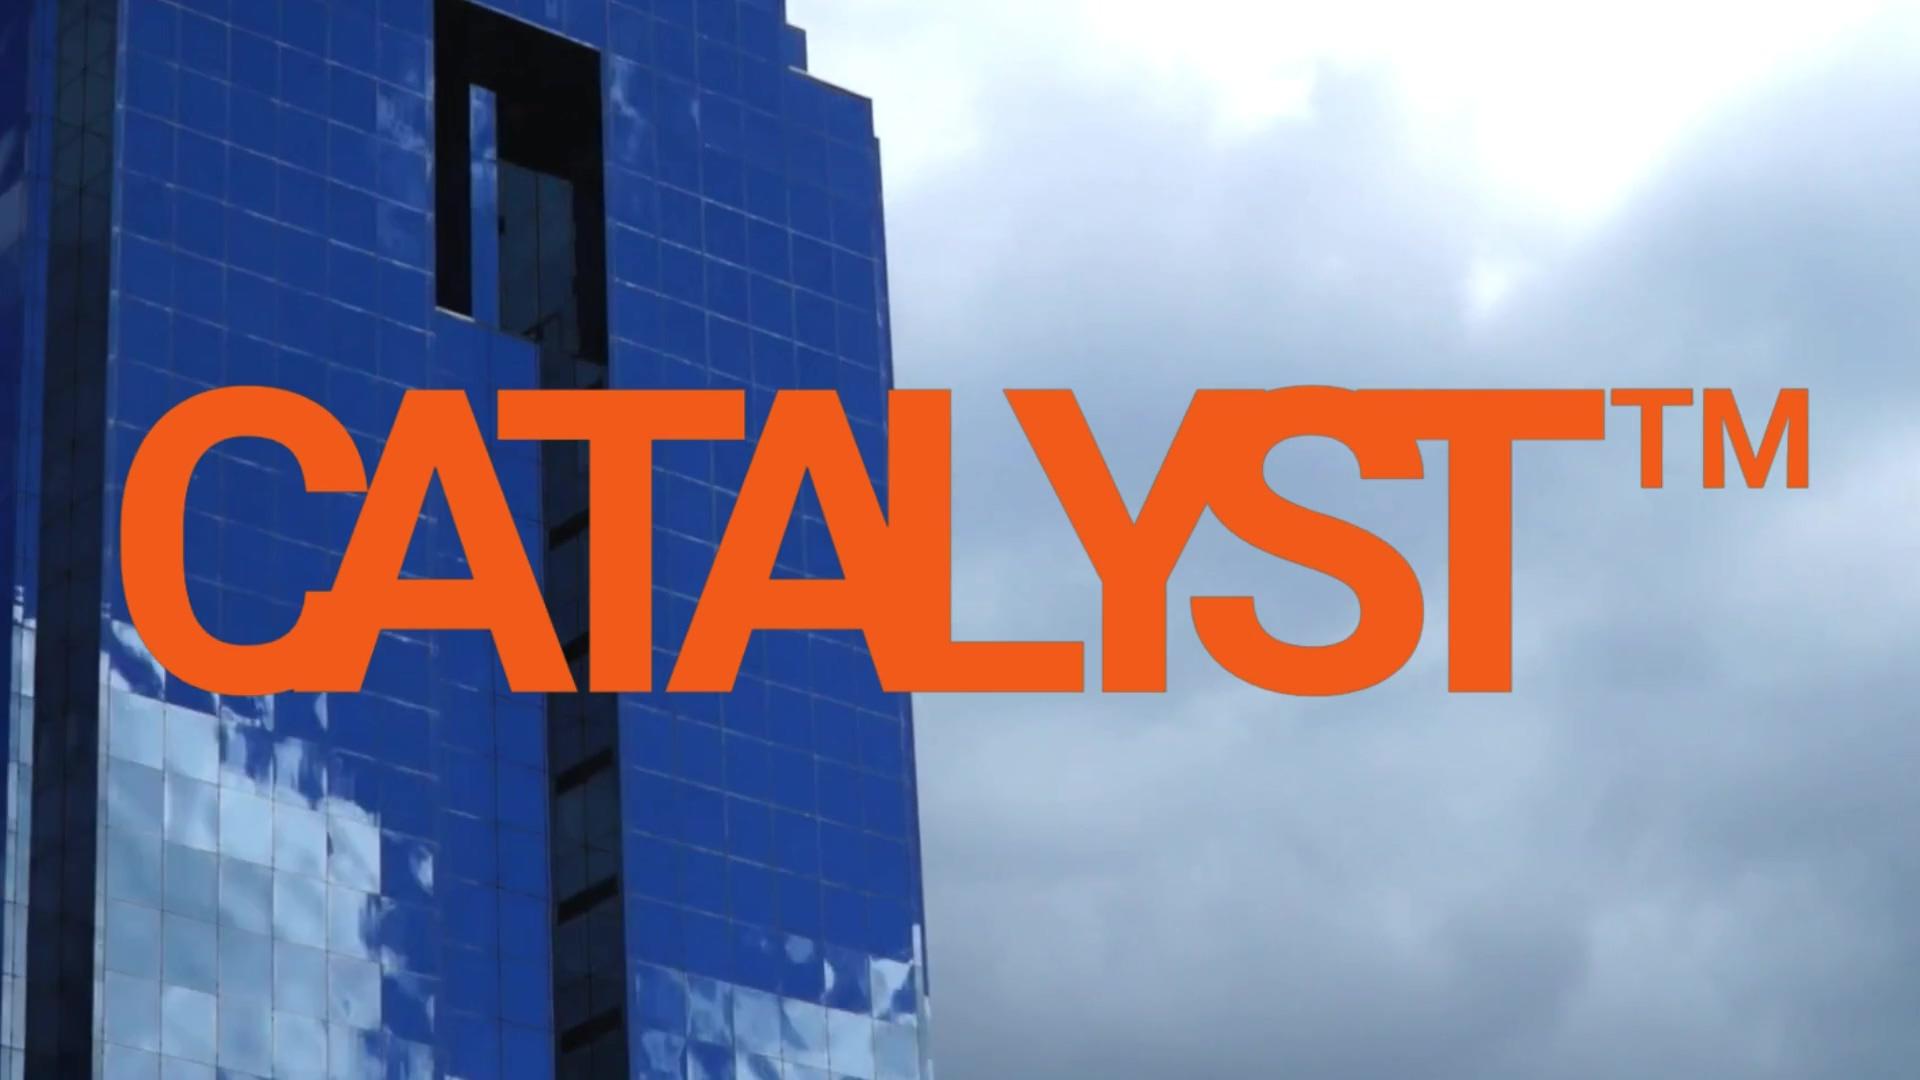 Catalyst FR promo video for LP